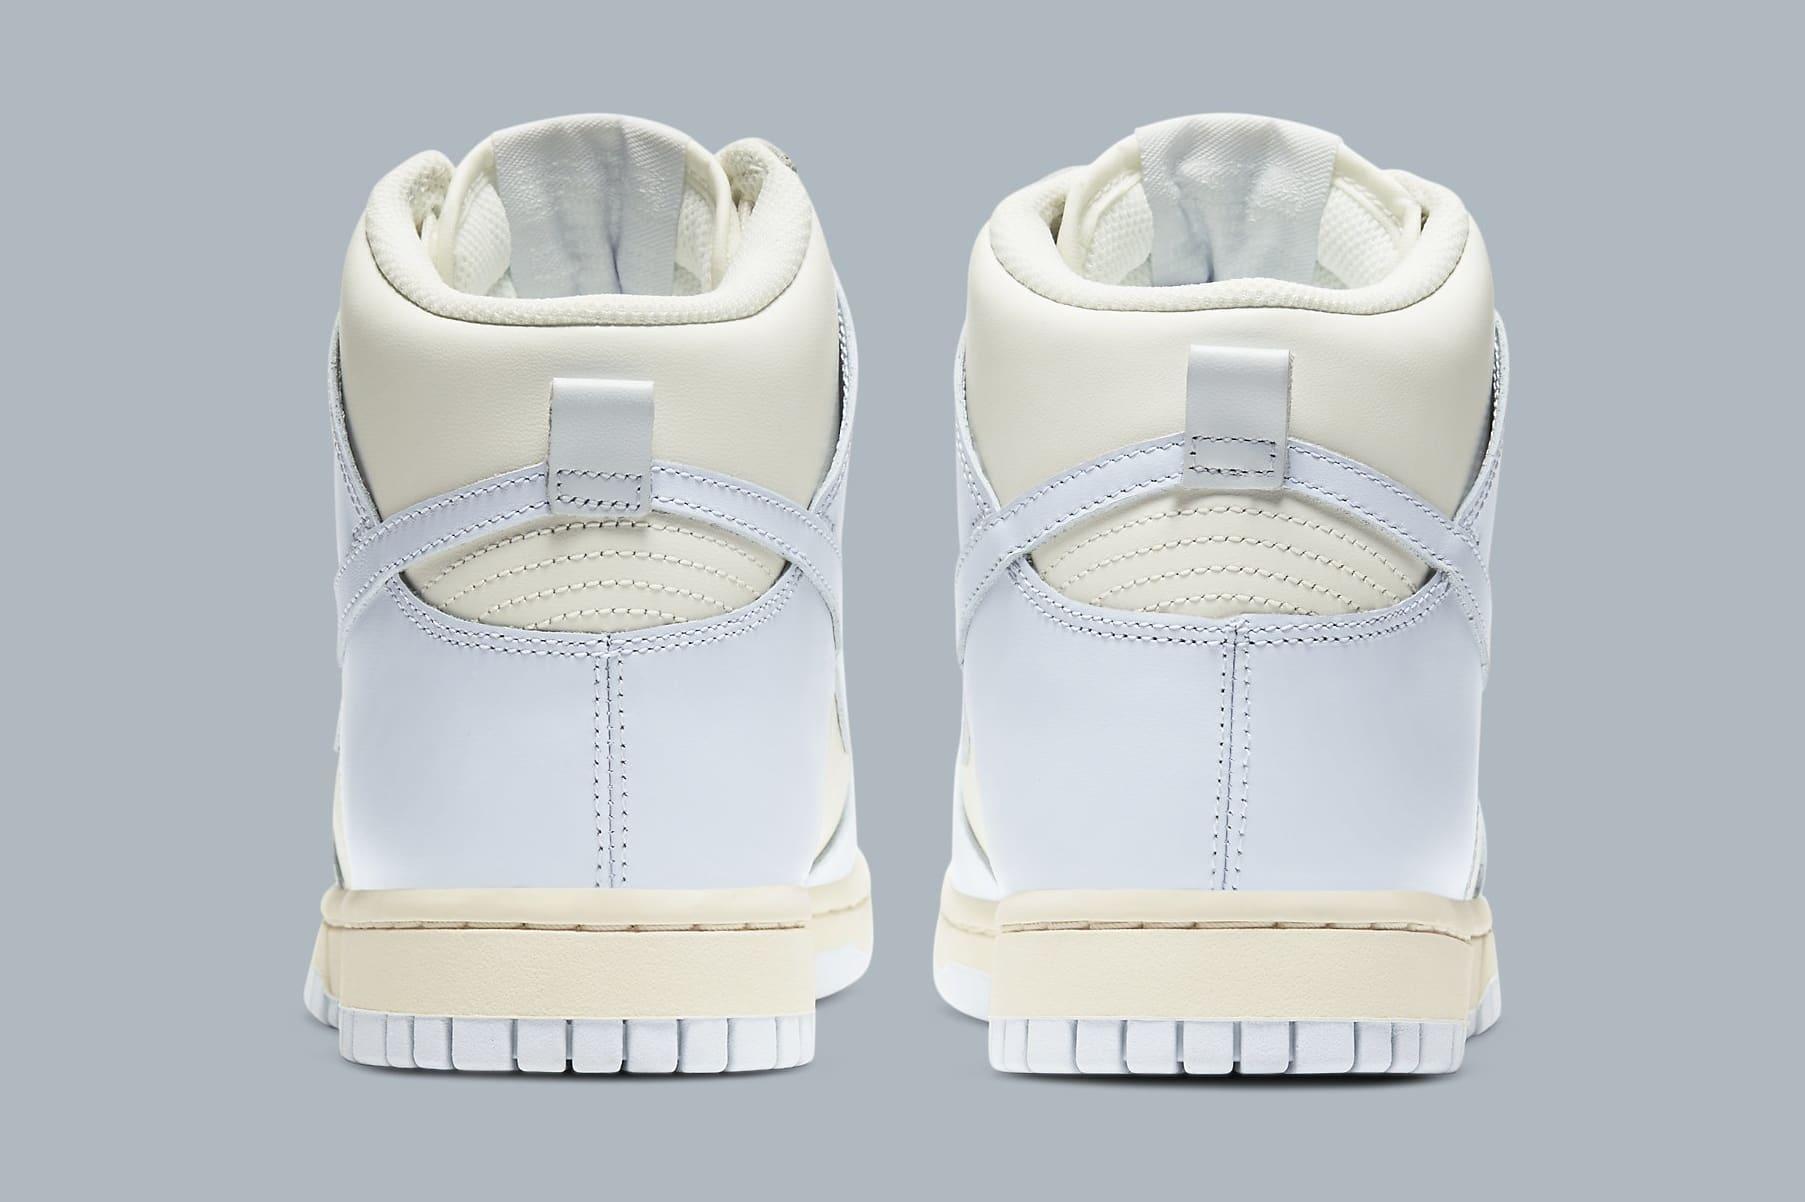 Nike Dunk High Women's 'Pale Ivory' DD1869-102 Heel